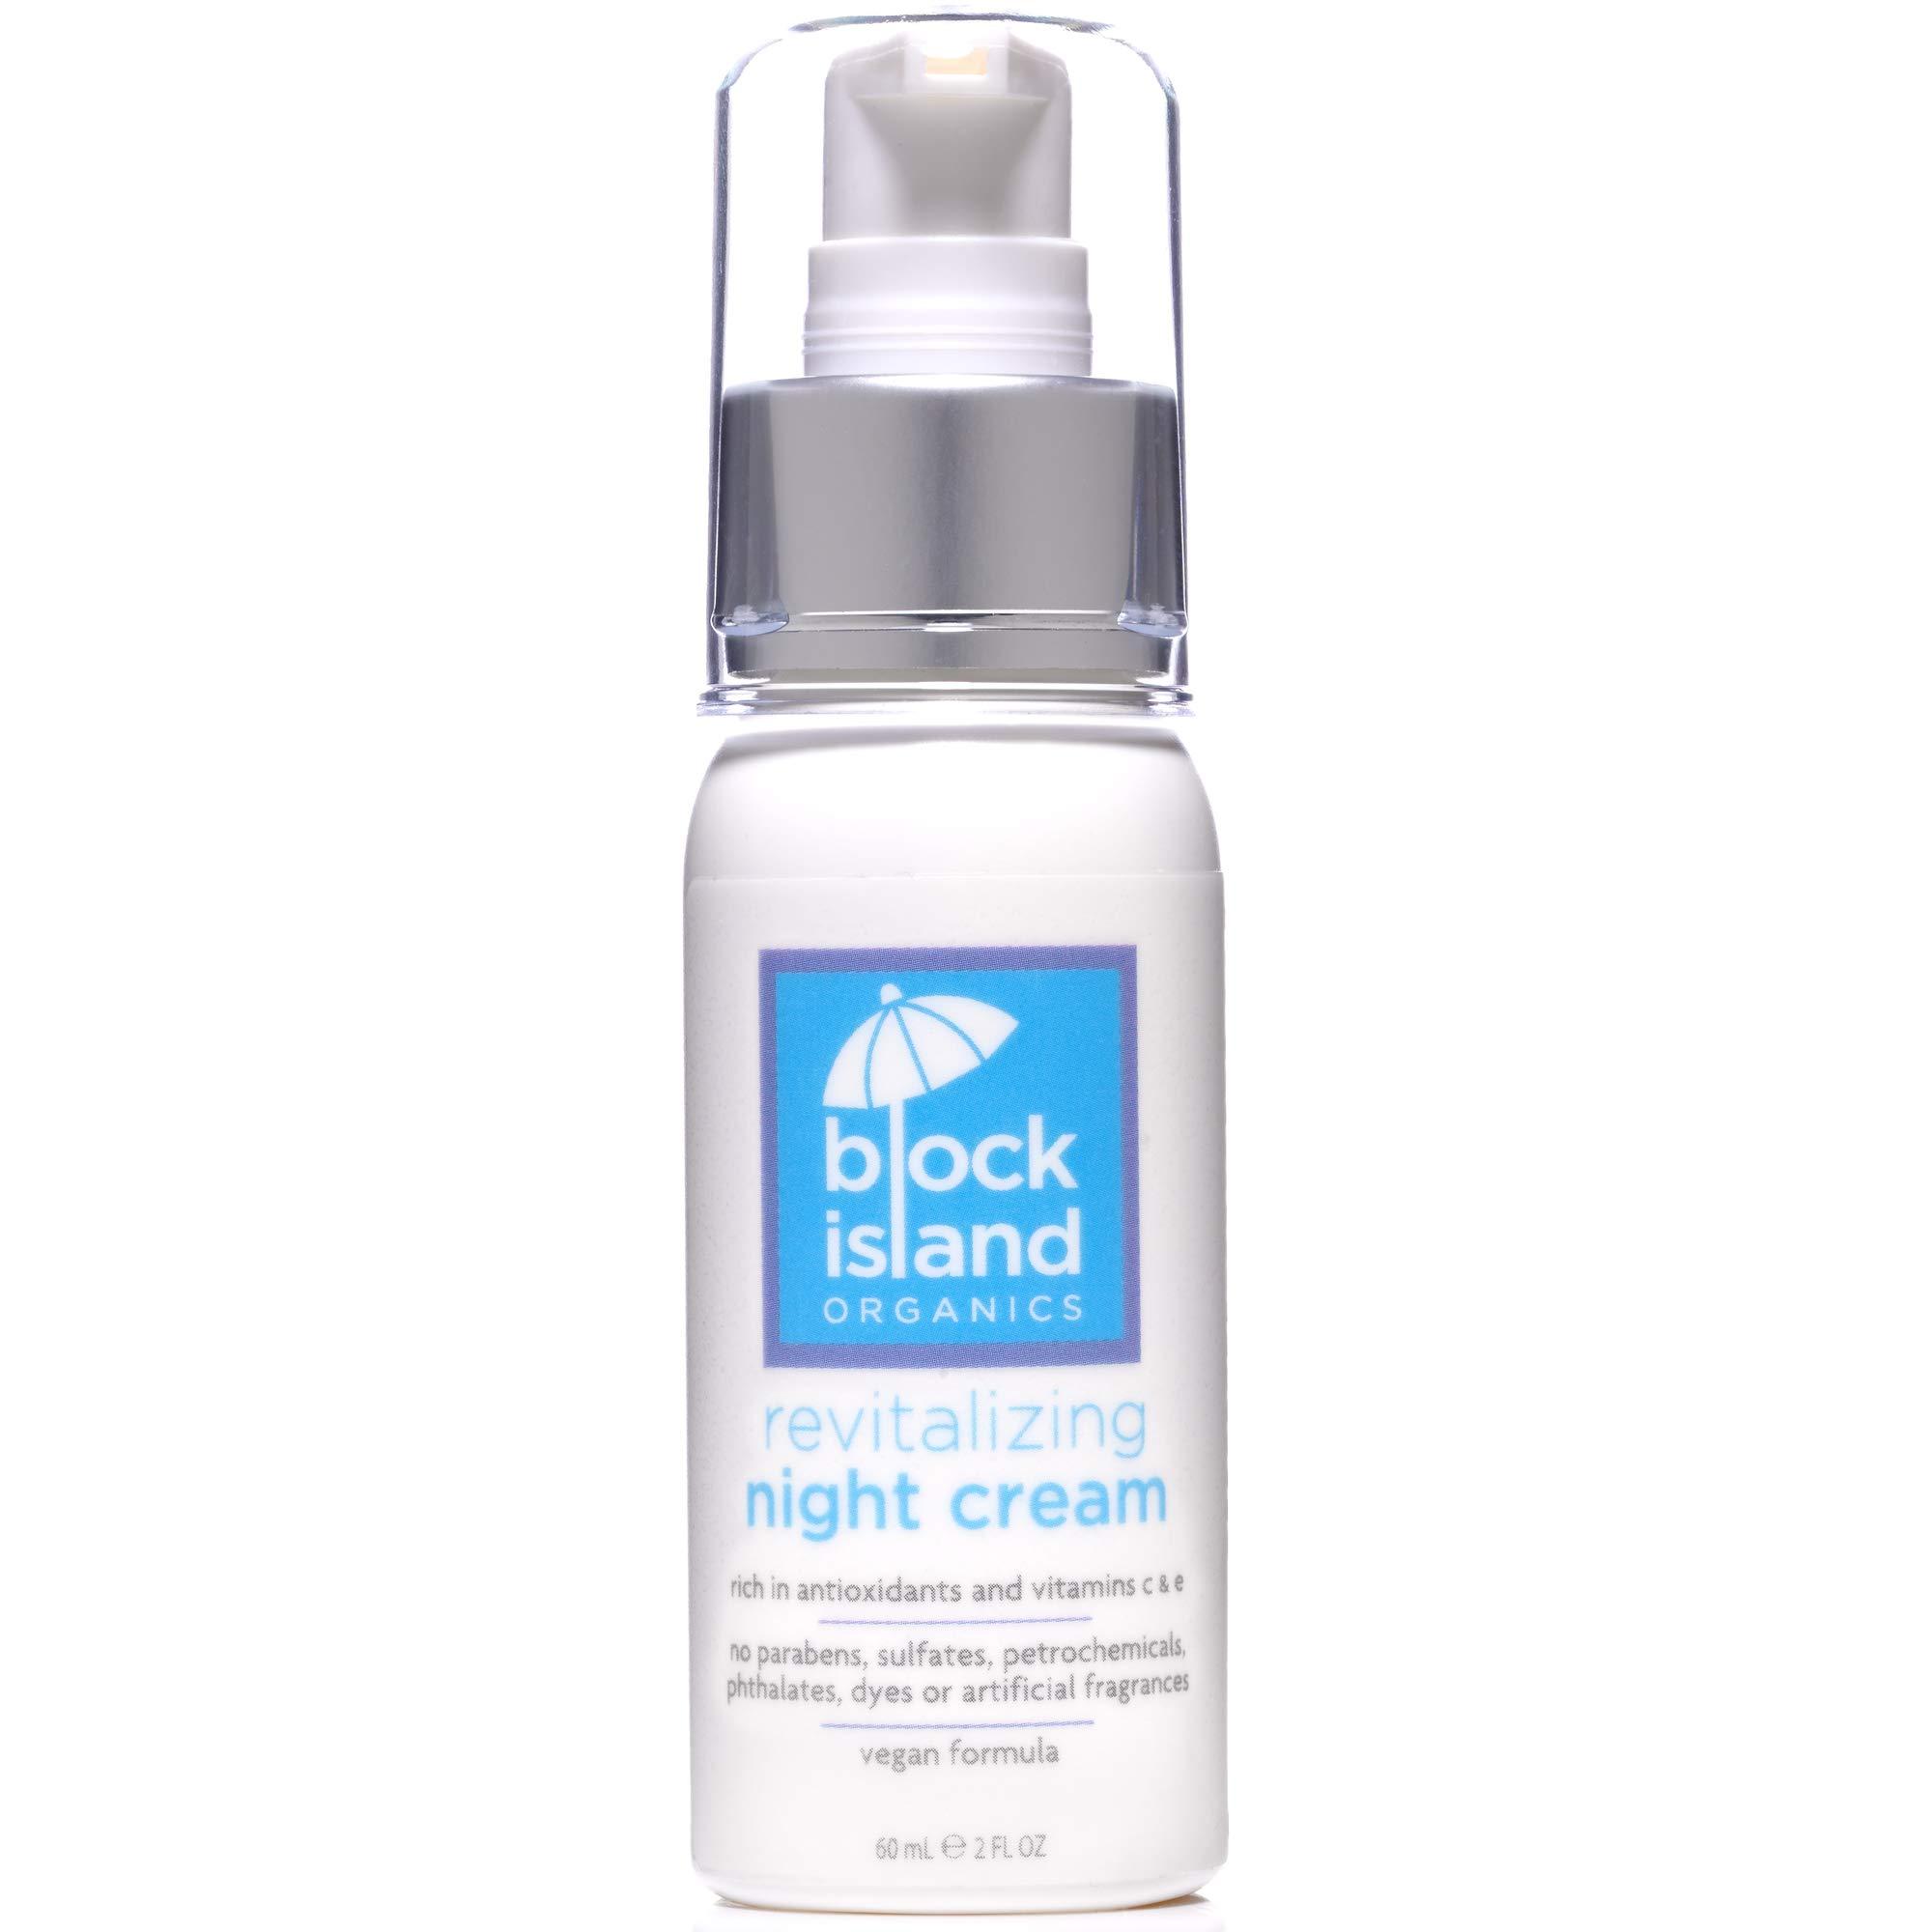 Block Island Organics Revitalizing Night Cream - Organic Anti-Aging Face Moisturizer with Natural Anti-Oxidants Vitamin C & E – EWG Top Rated - Sensitive Skin Care for Face, Eyes, and Neck - 2 OZ